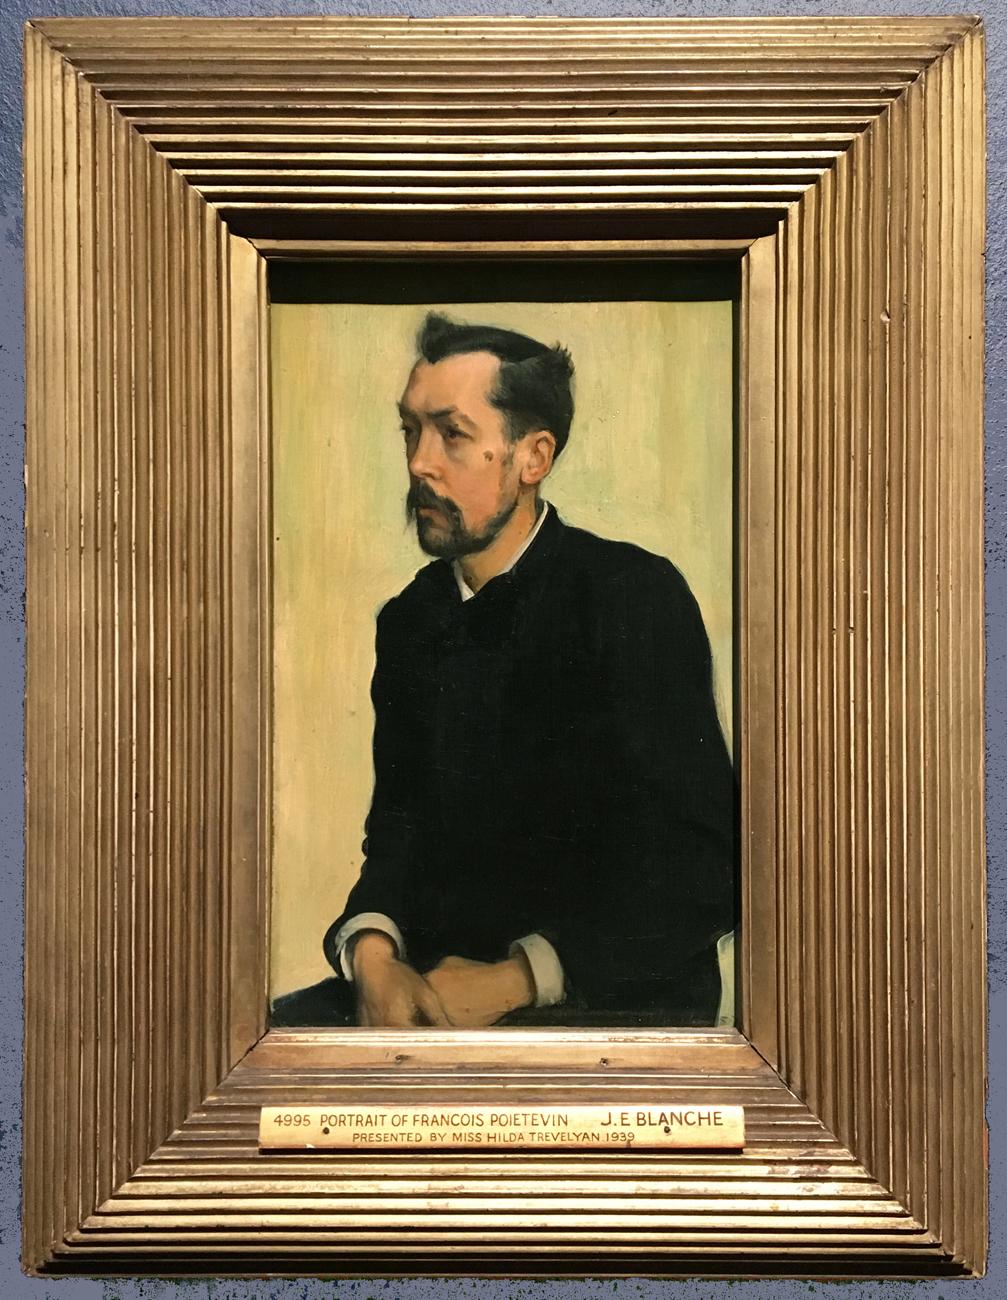 Рис.33 Жак-Эмиль Бланш (1861-1942), François Poictevin, 1887